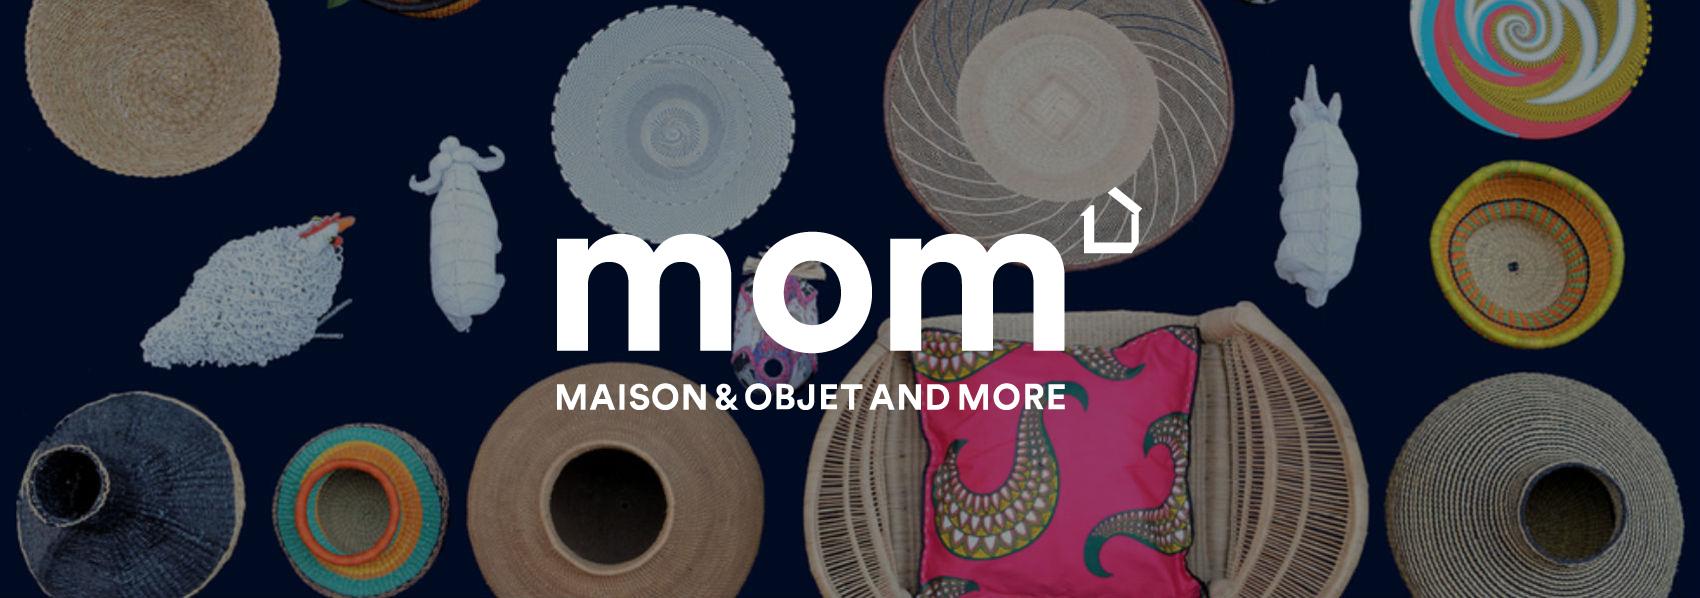 19-23 januari Gratis toegang Maison&Objet